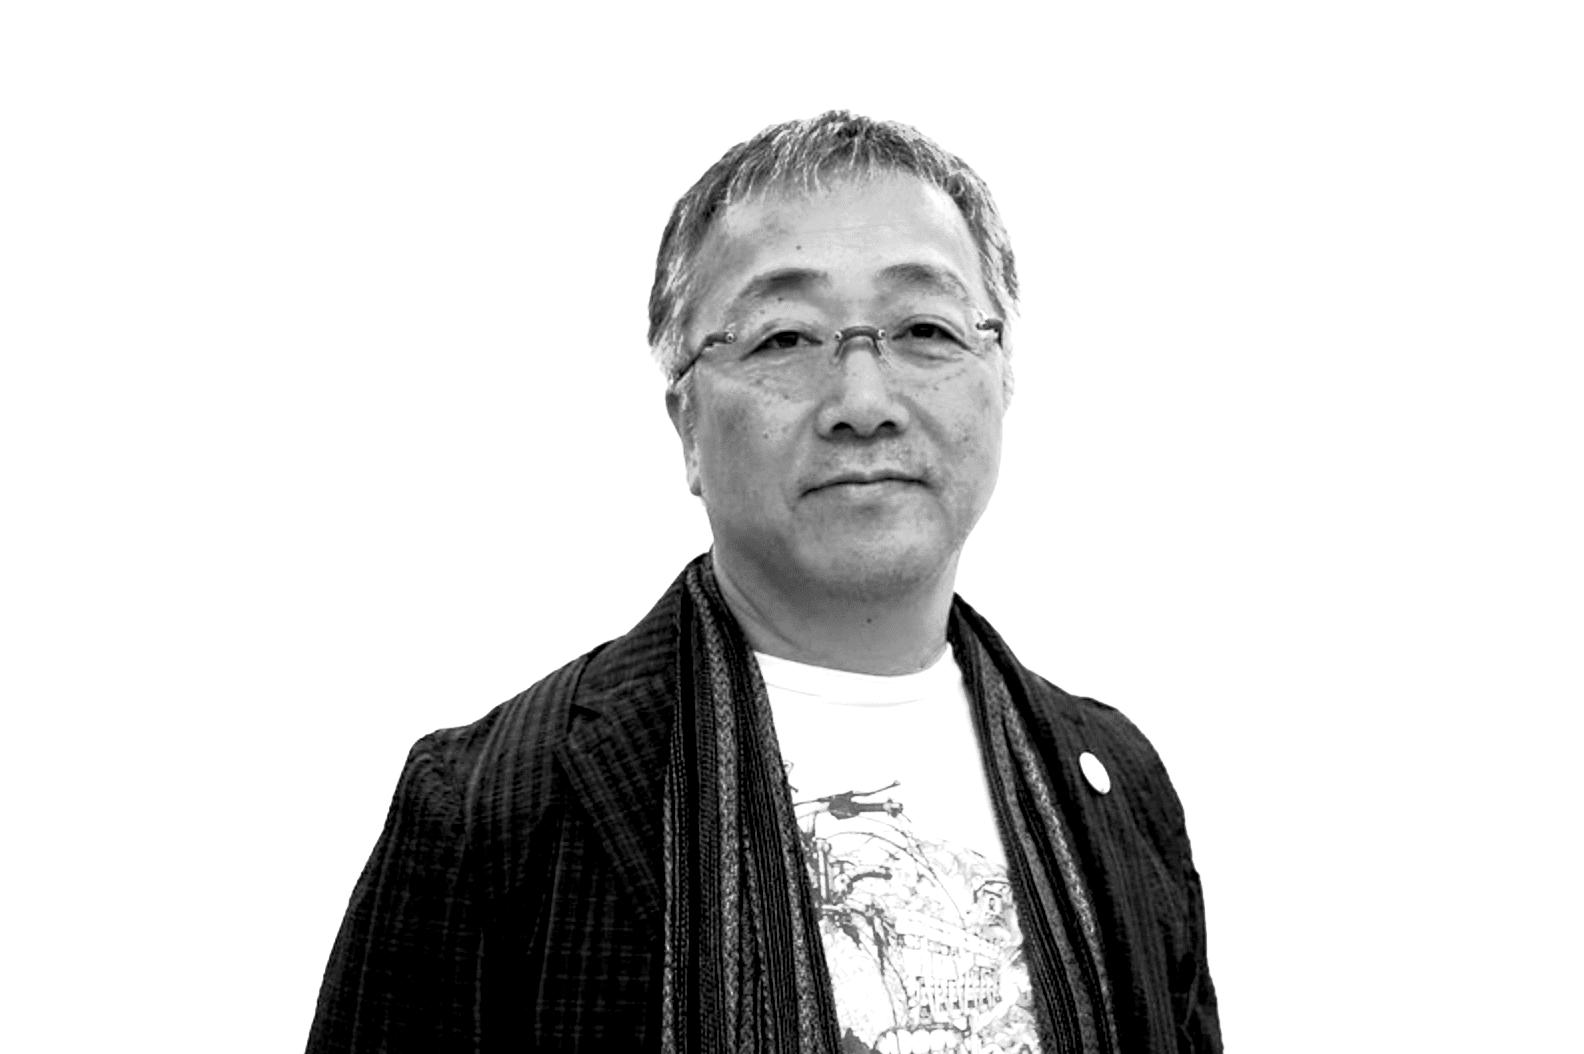 portrait of Katsuhiro Otomo